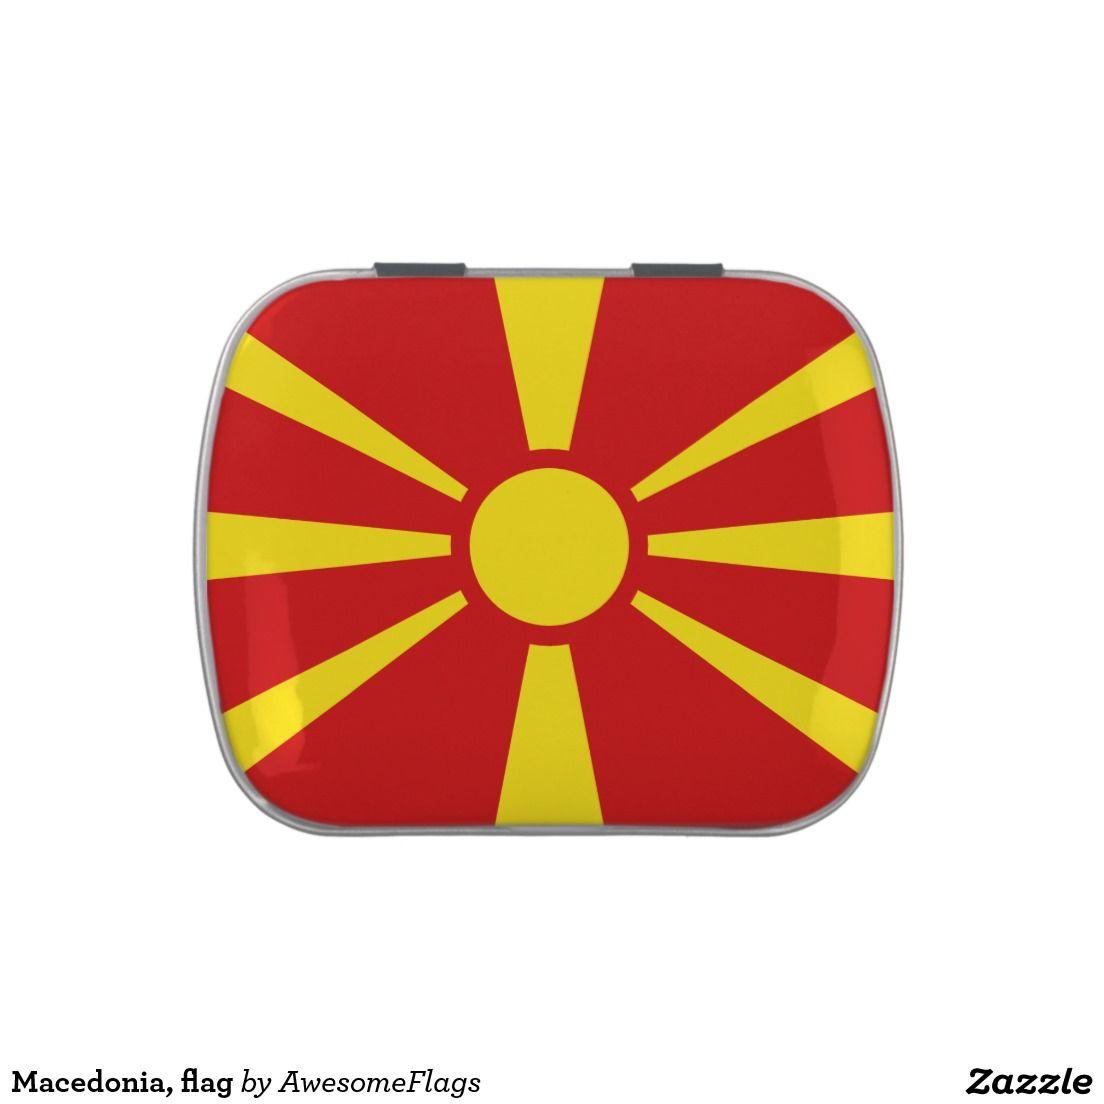 Macedonia, flag